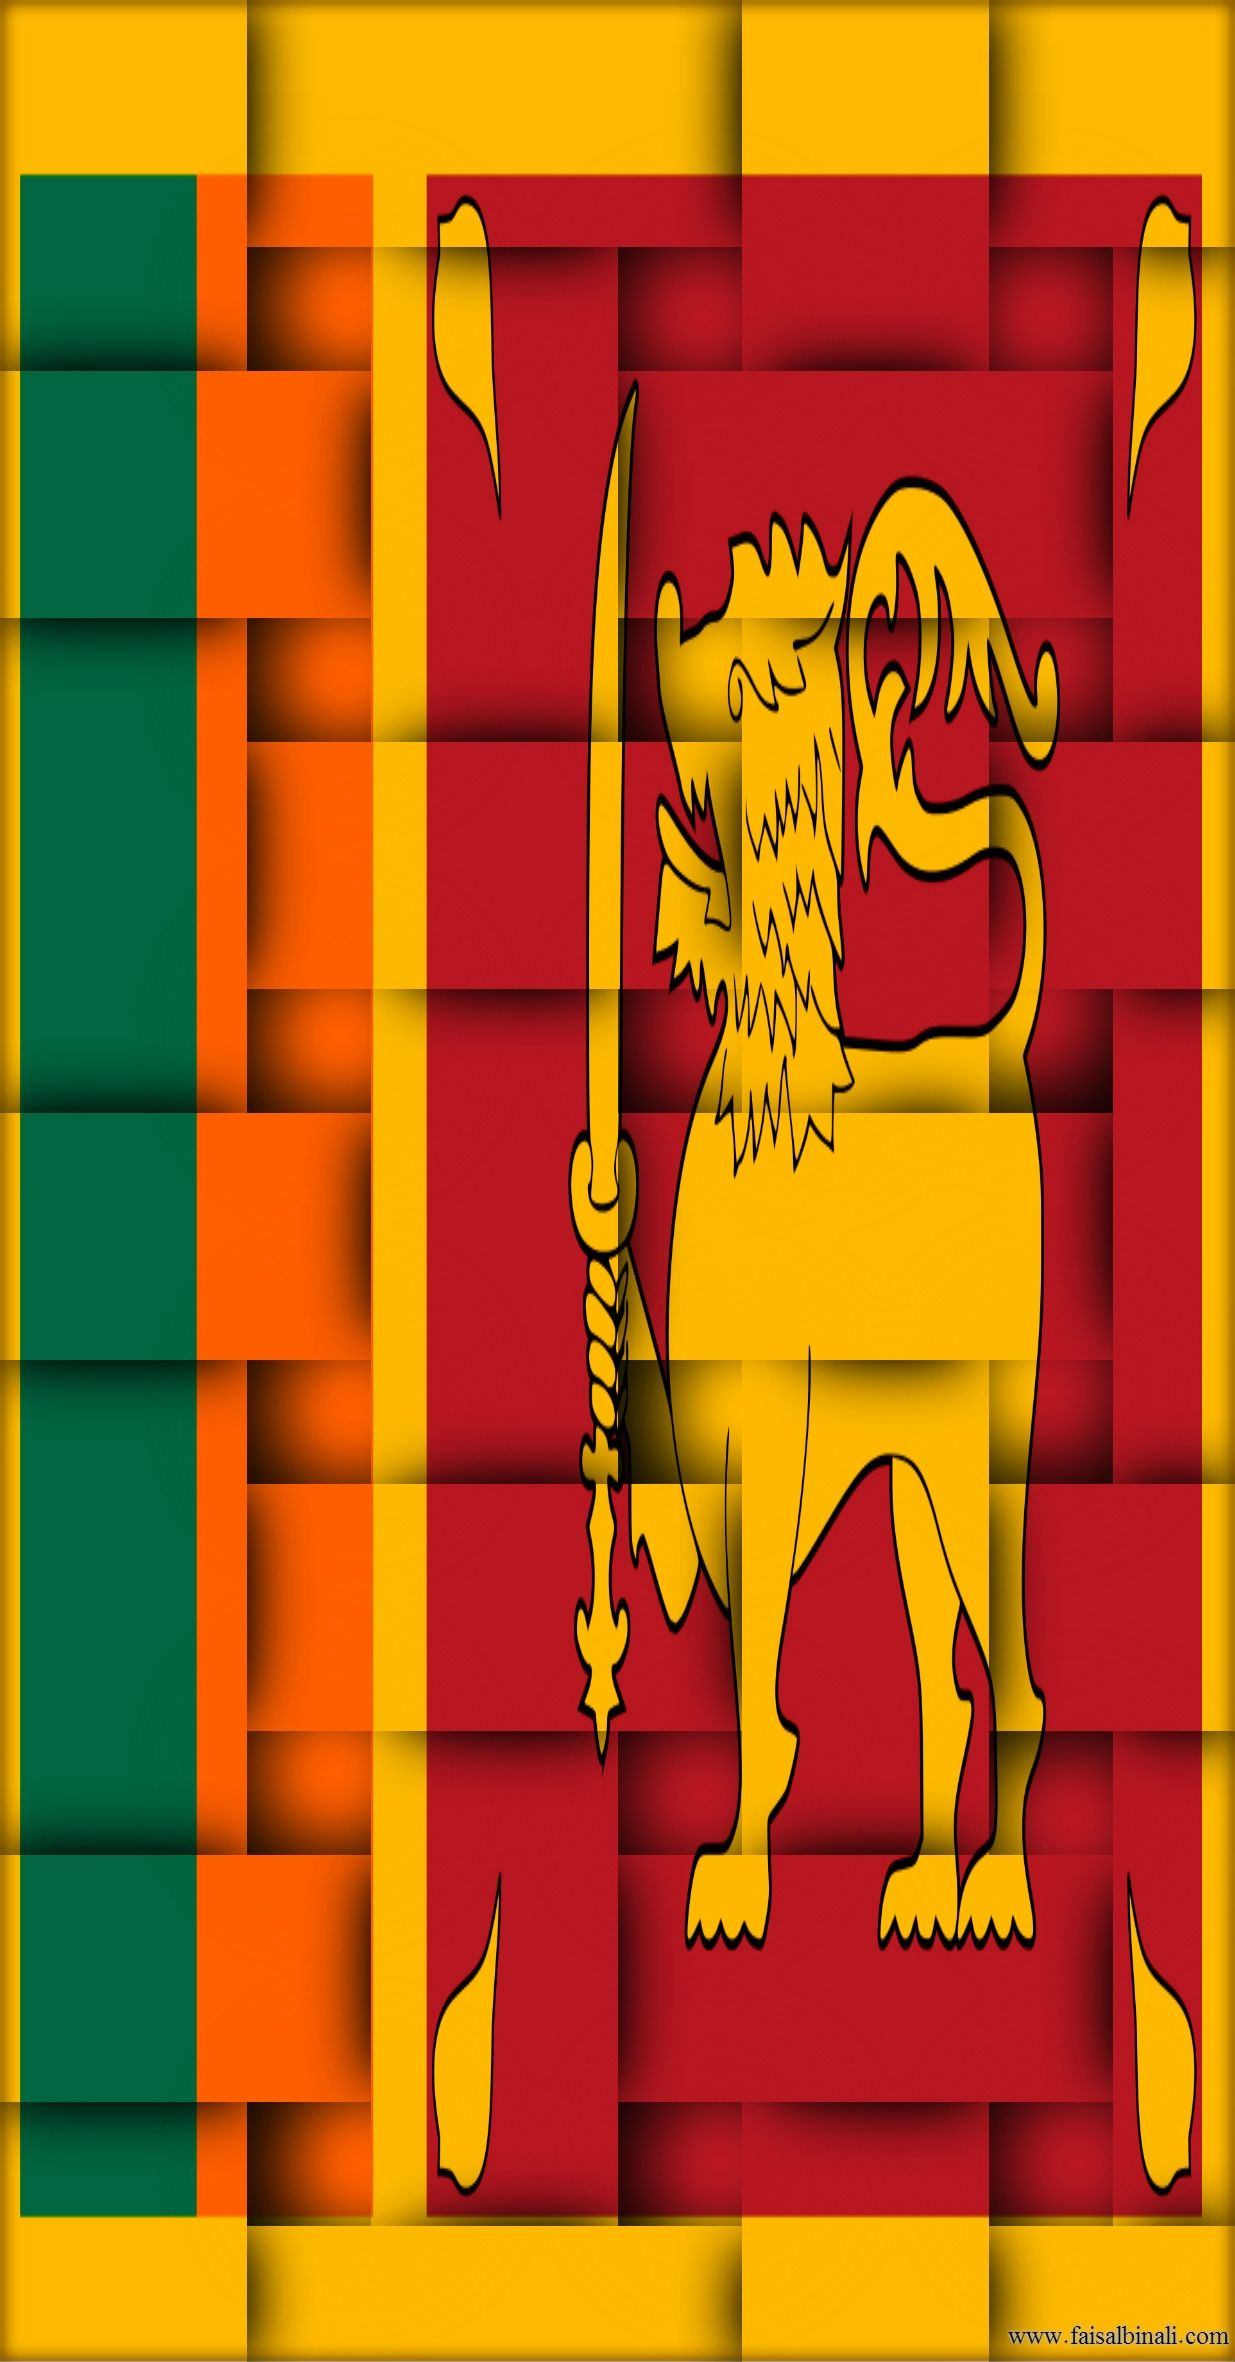 Sri Lanka Flag Hd Wallpapers For Smartphones And Tablets